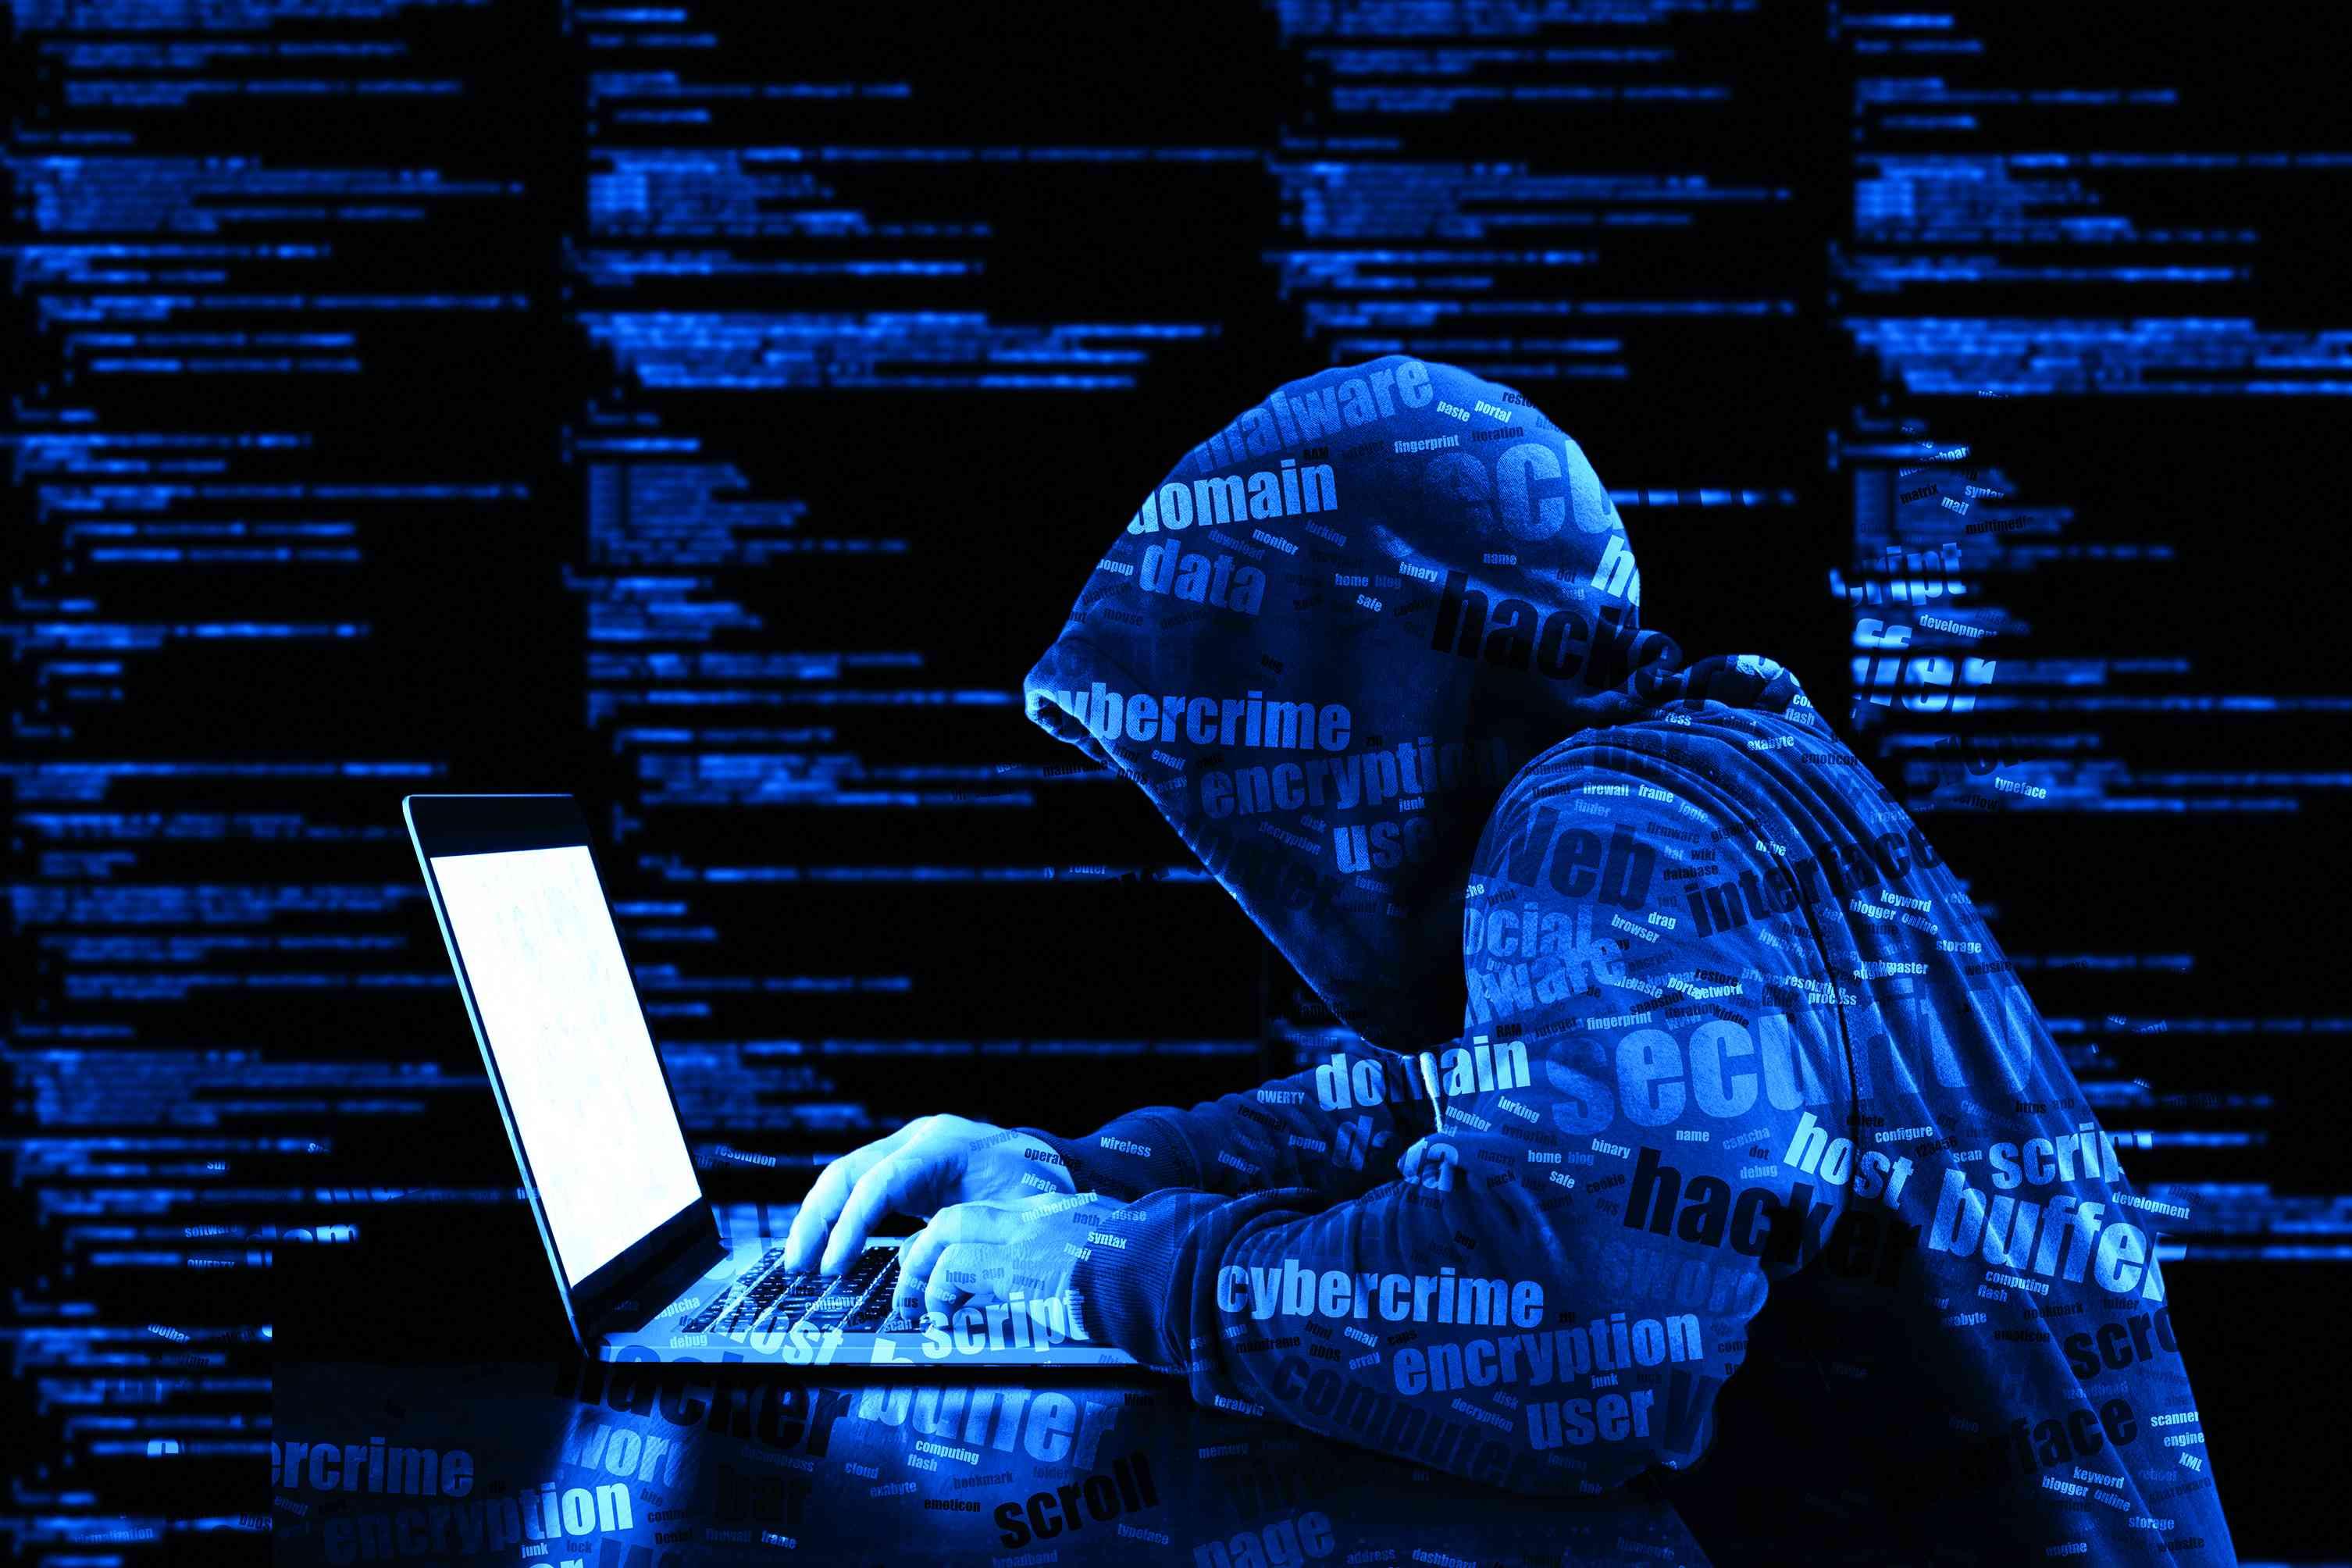 cyber_crime1